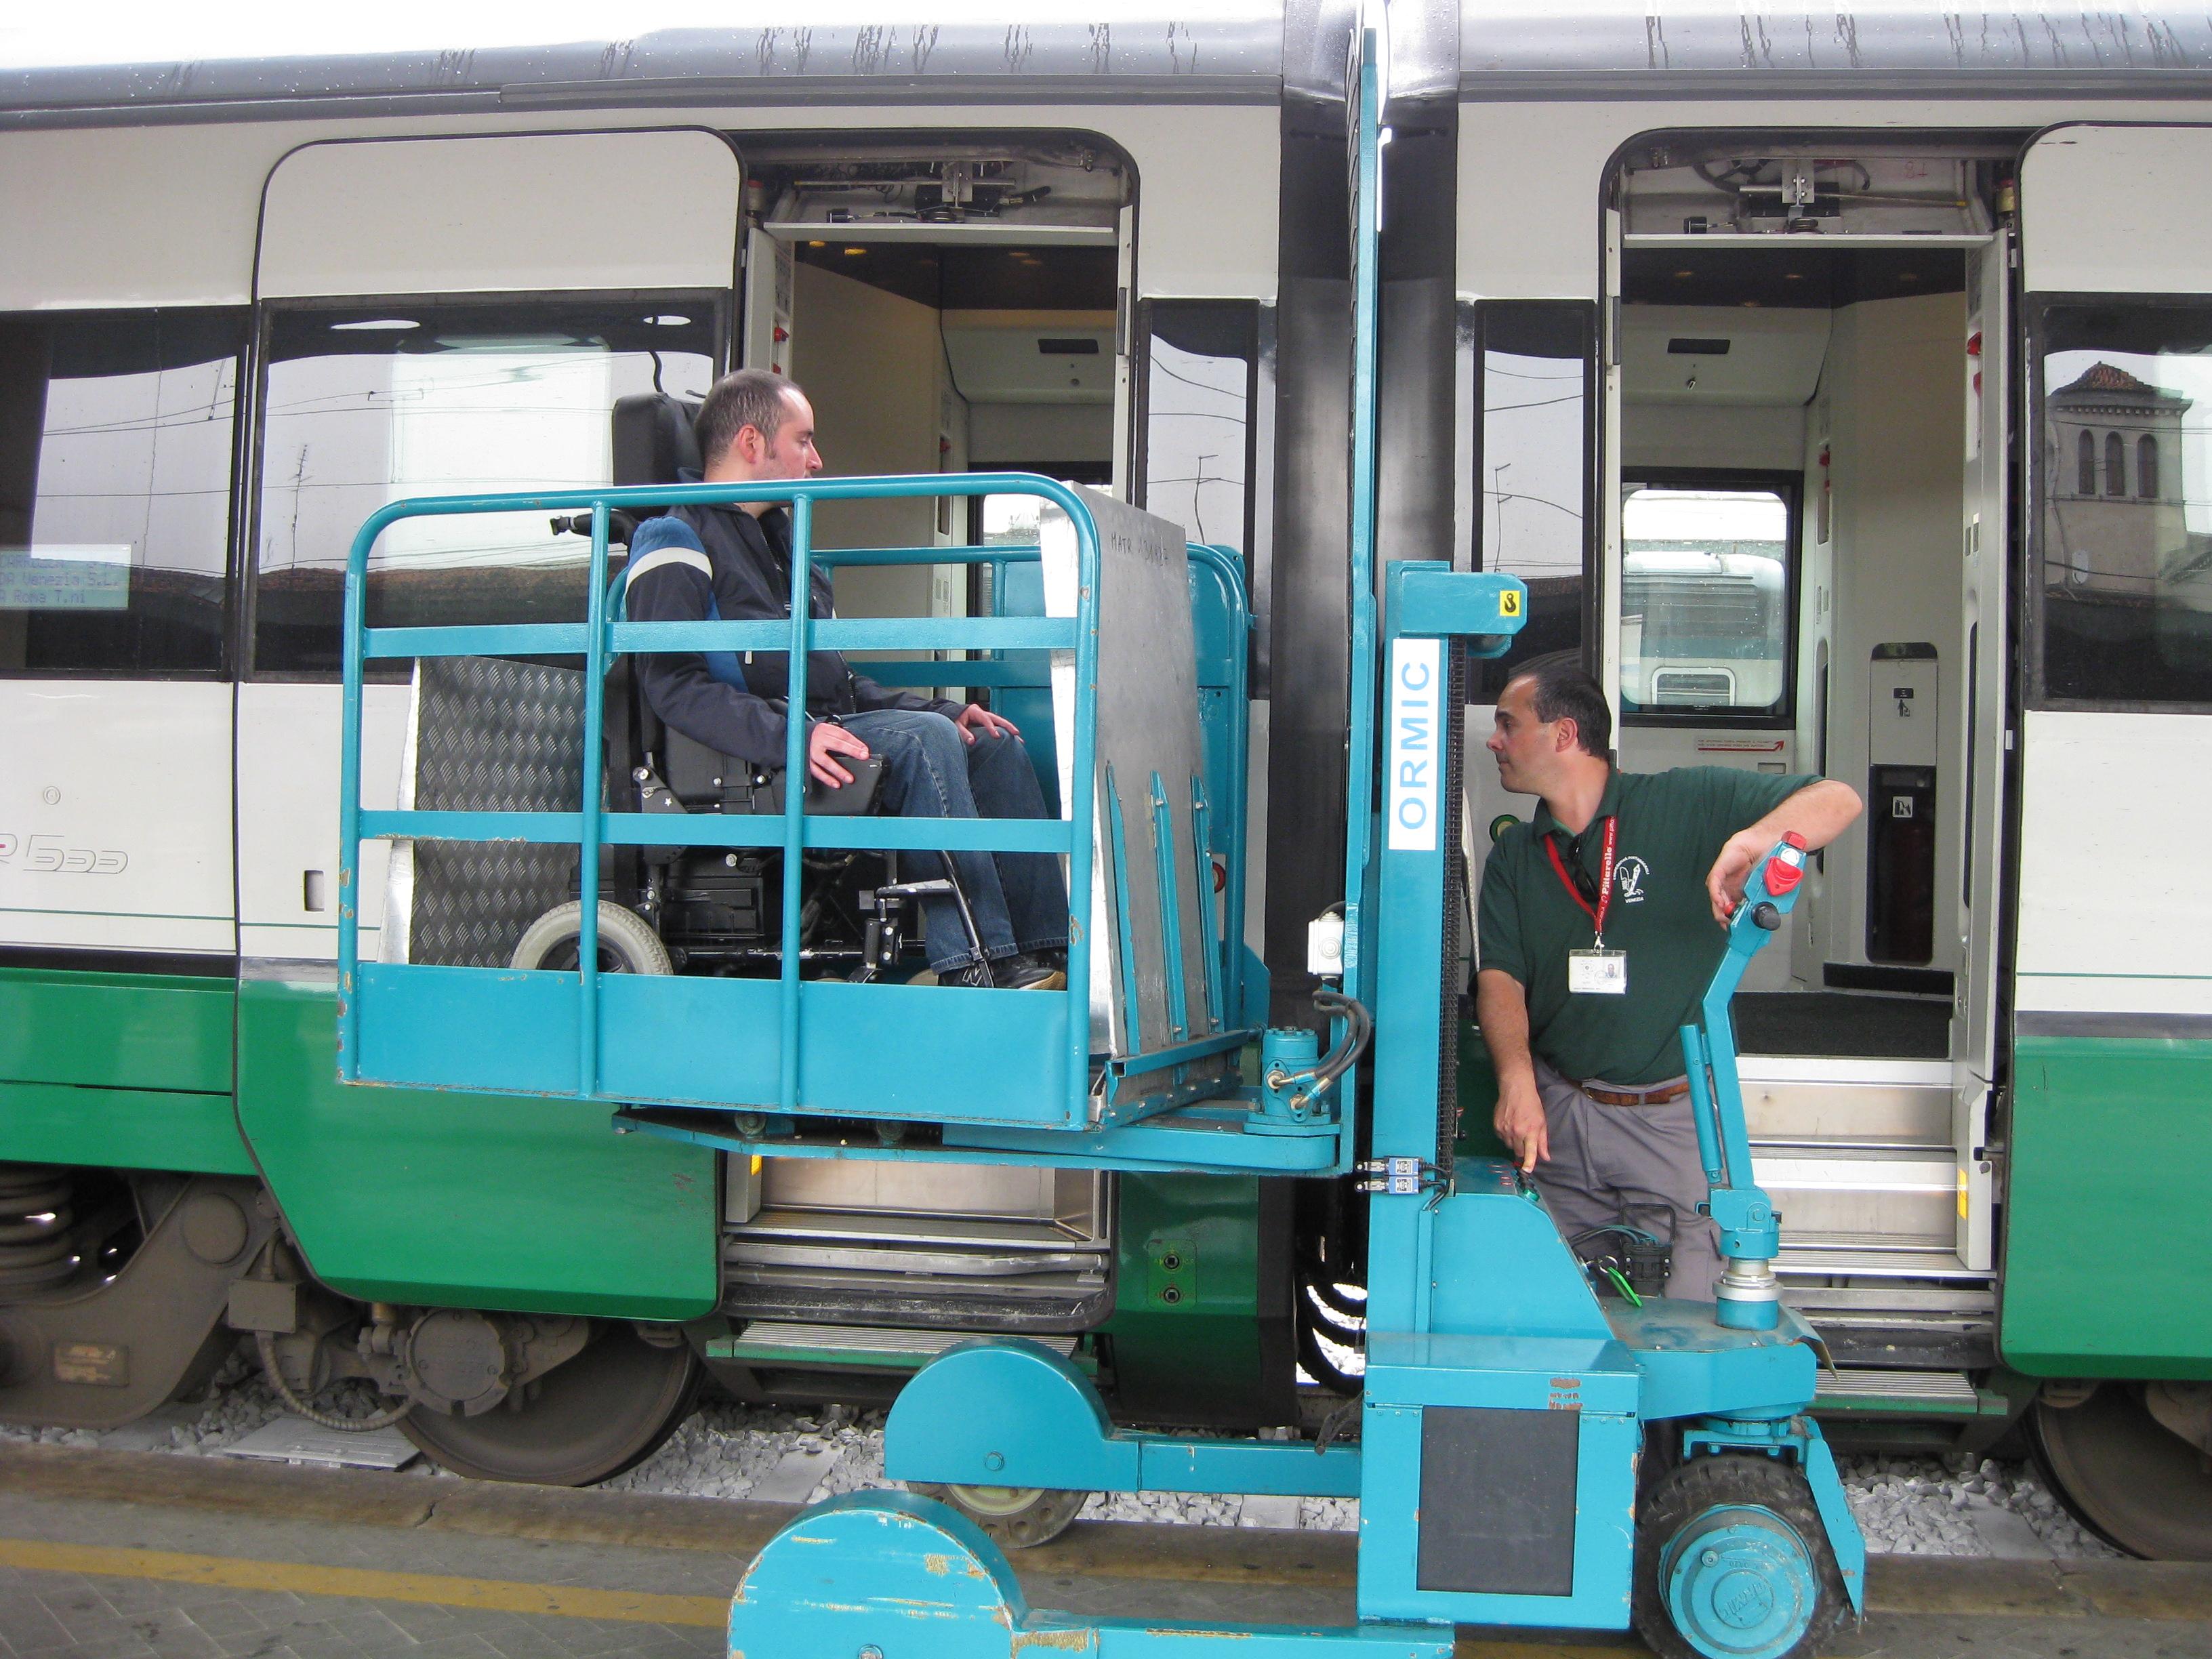 Sale Blu Ferrovie : Ferrovie rfi stazione di metaponto servizi sala blu entro